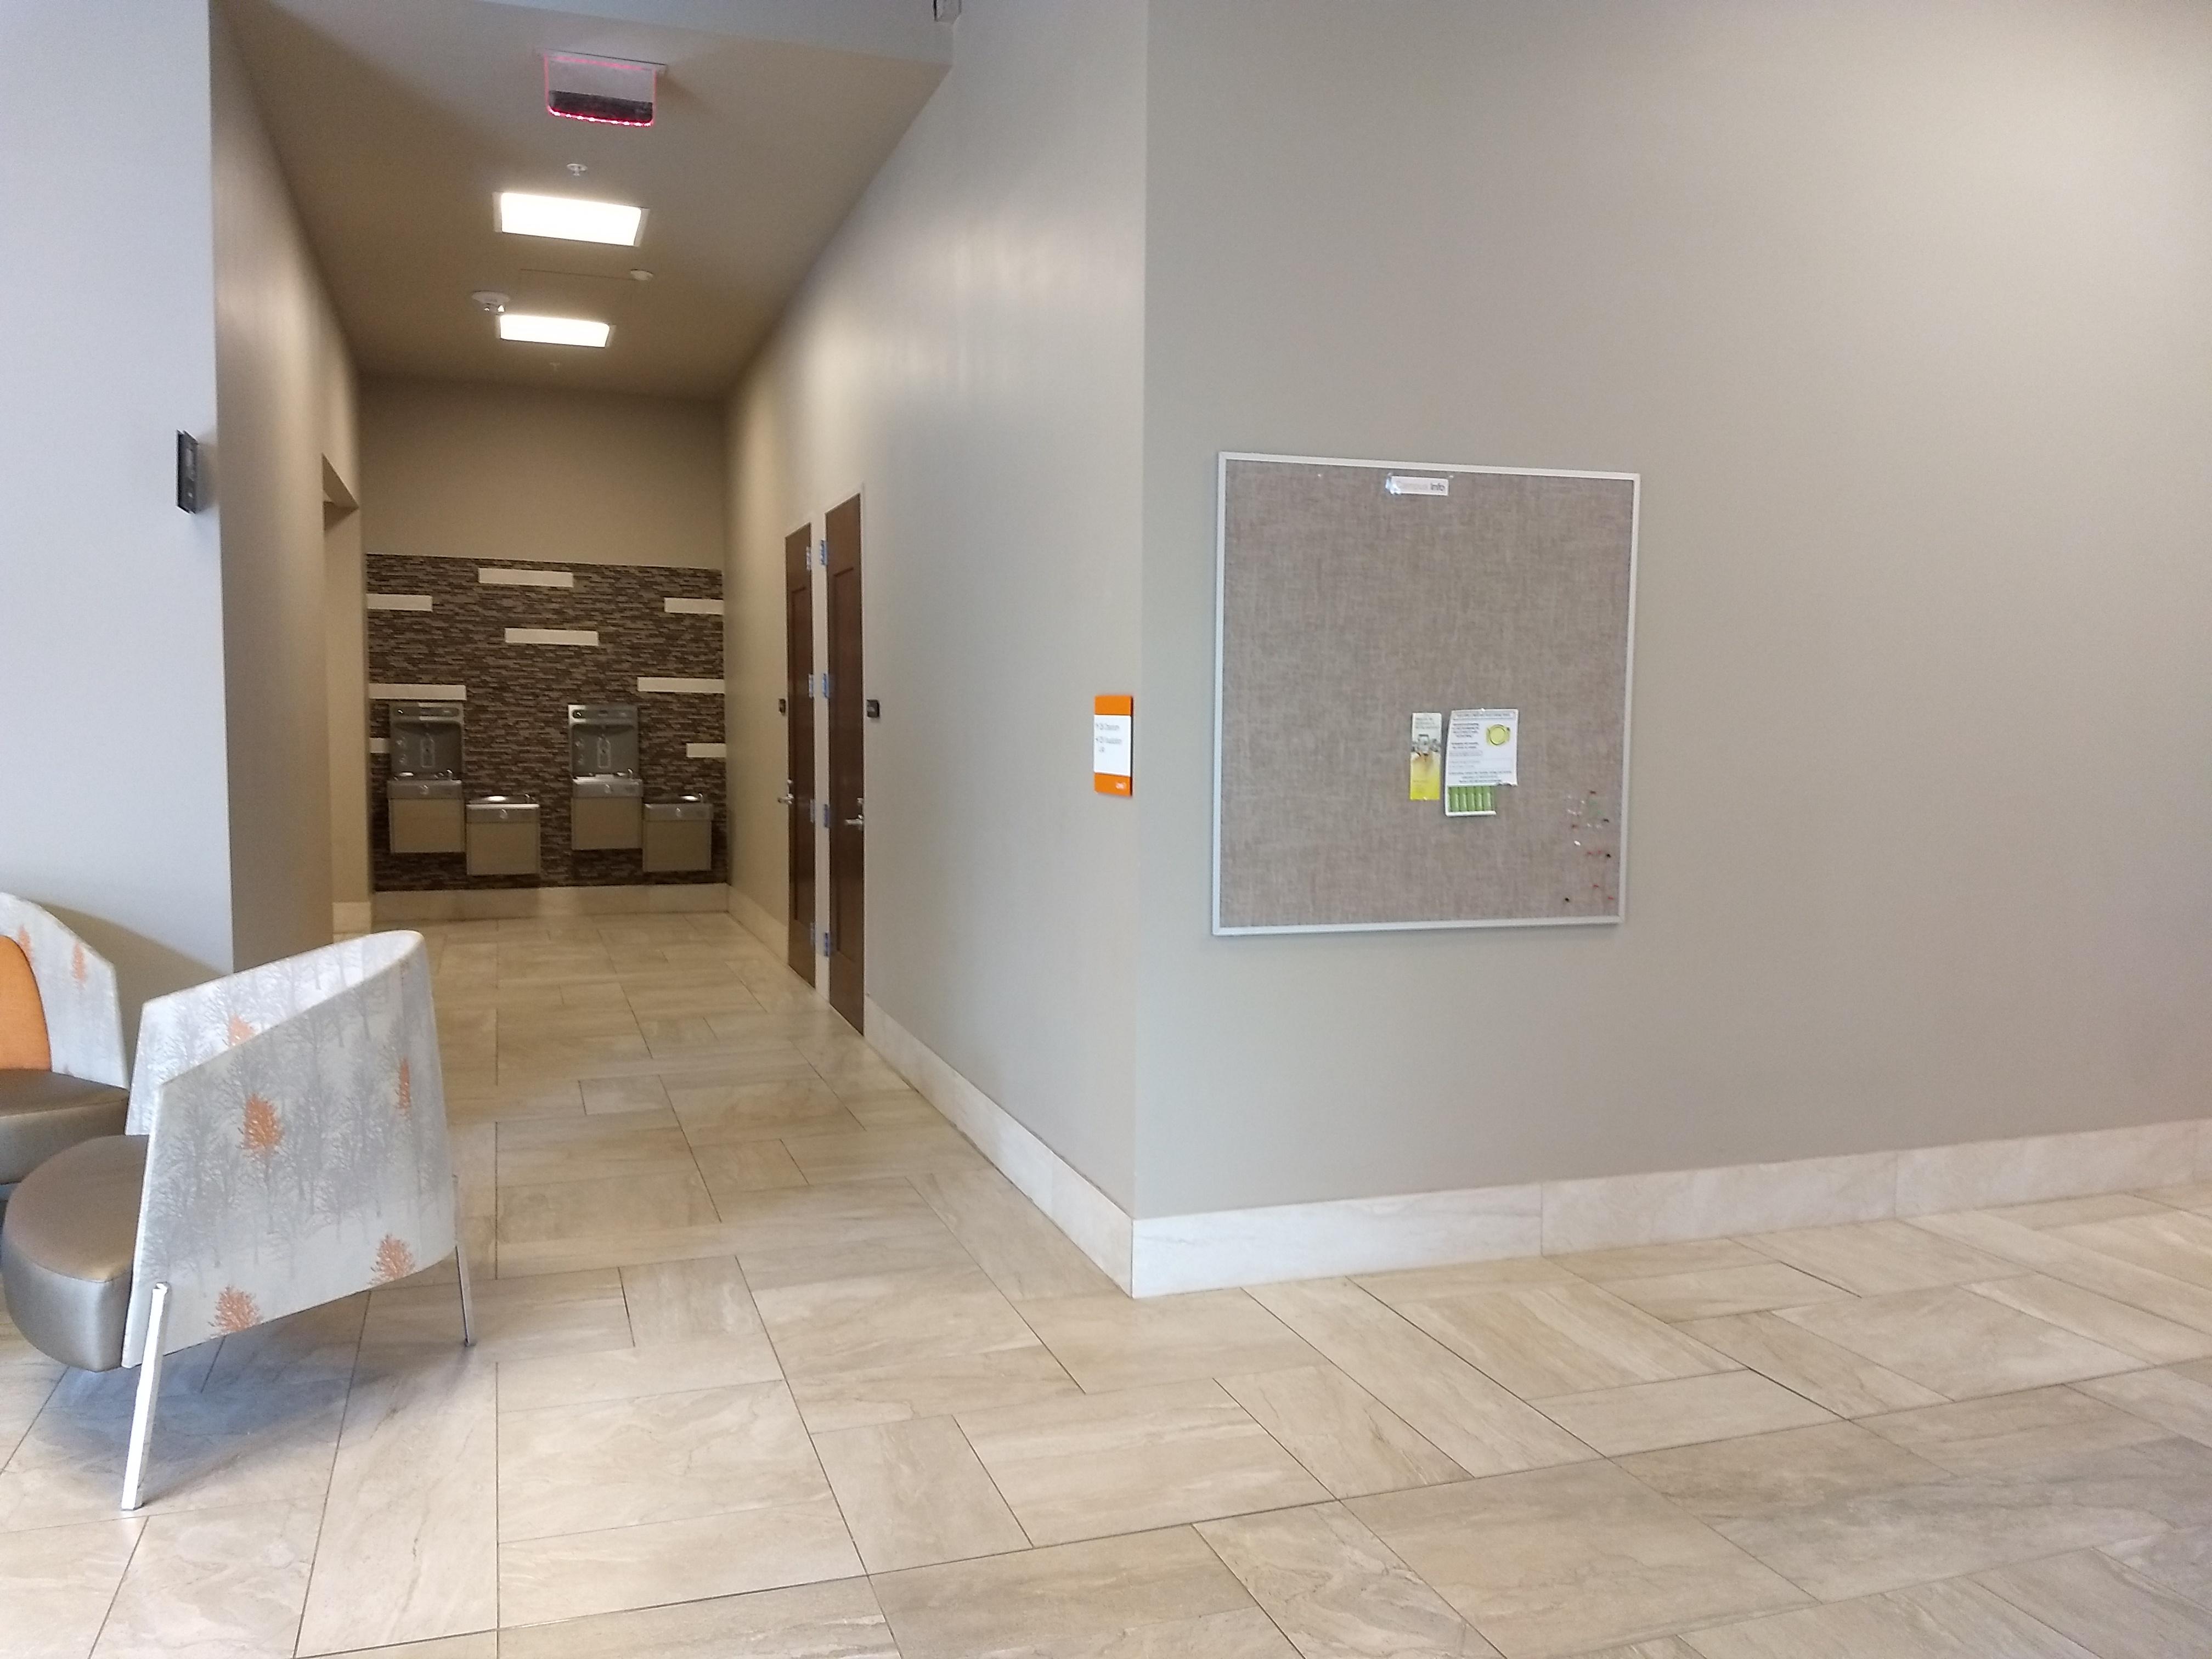 1st floor back exit near restrooms